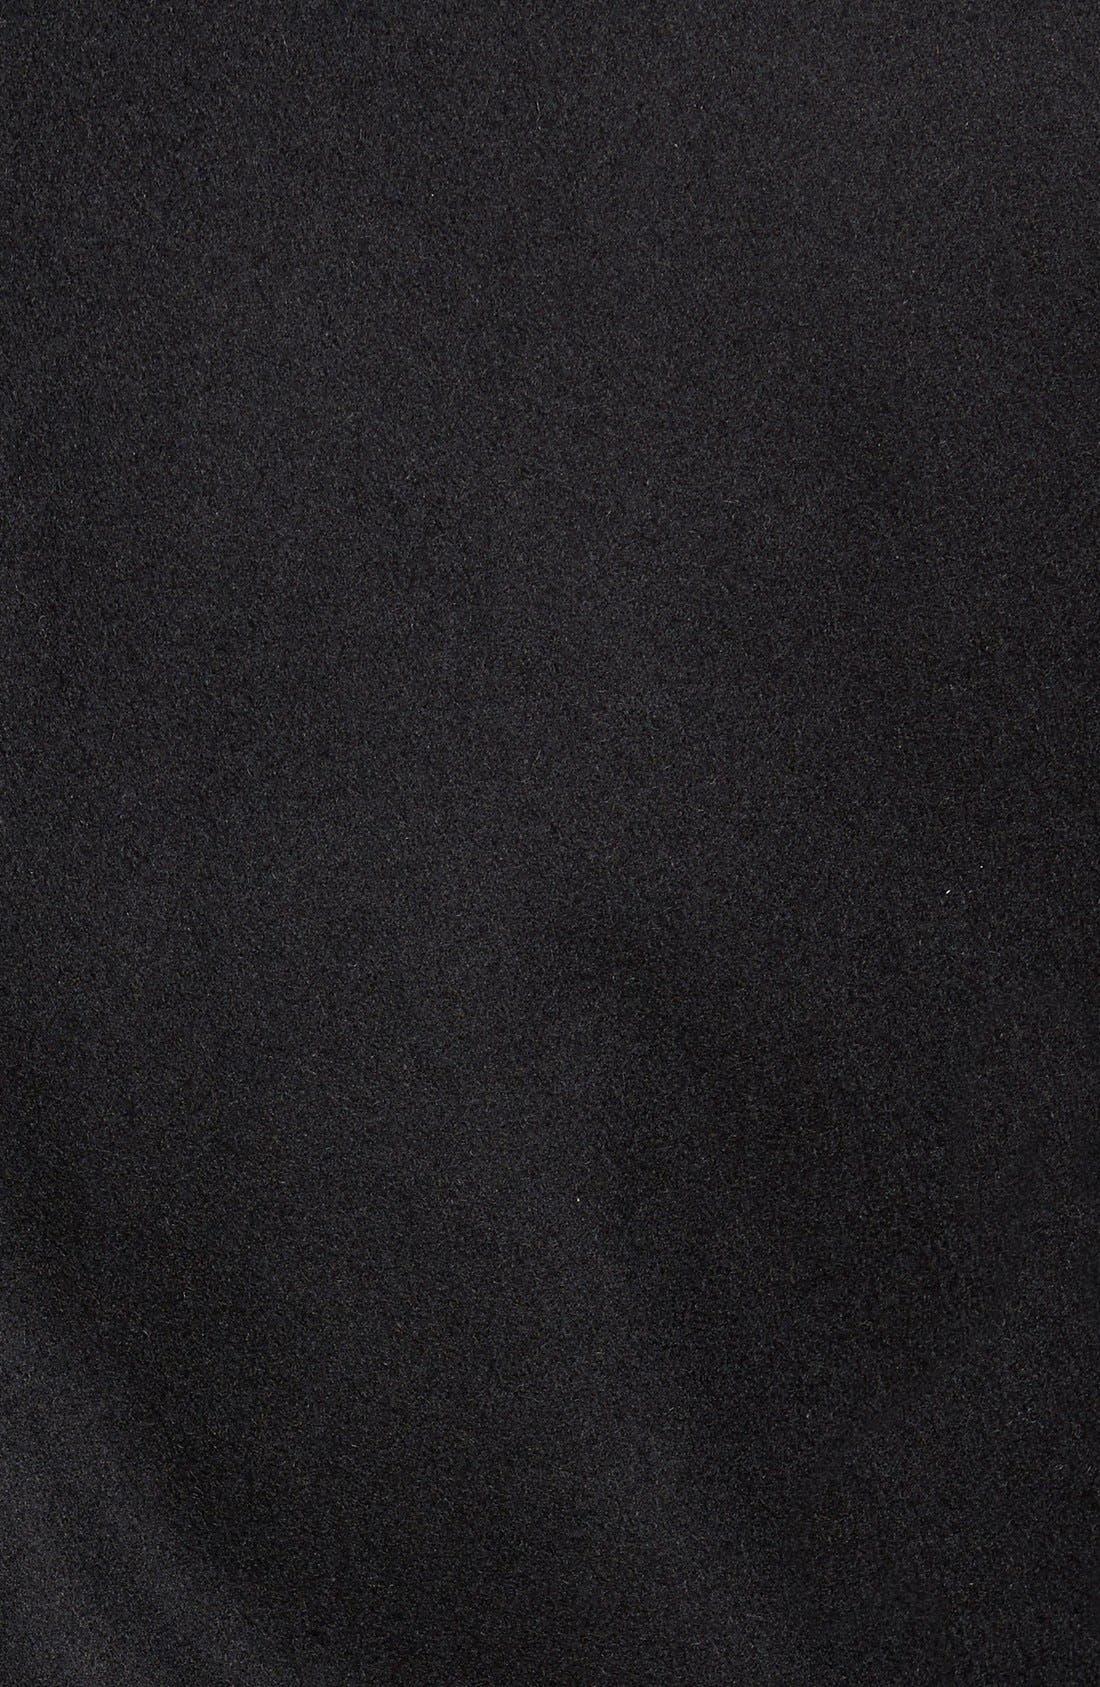 Wool Blend Jacket,                             Alternate thumbnail 2, color,                             Black